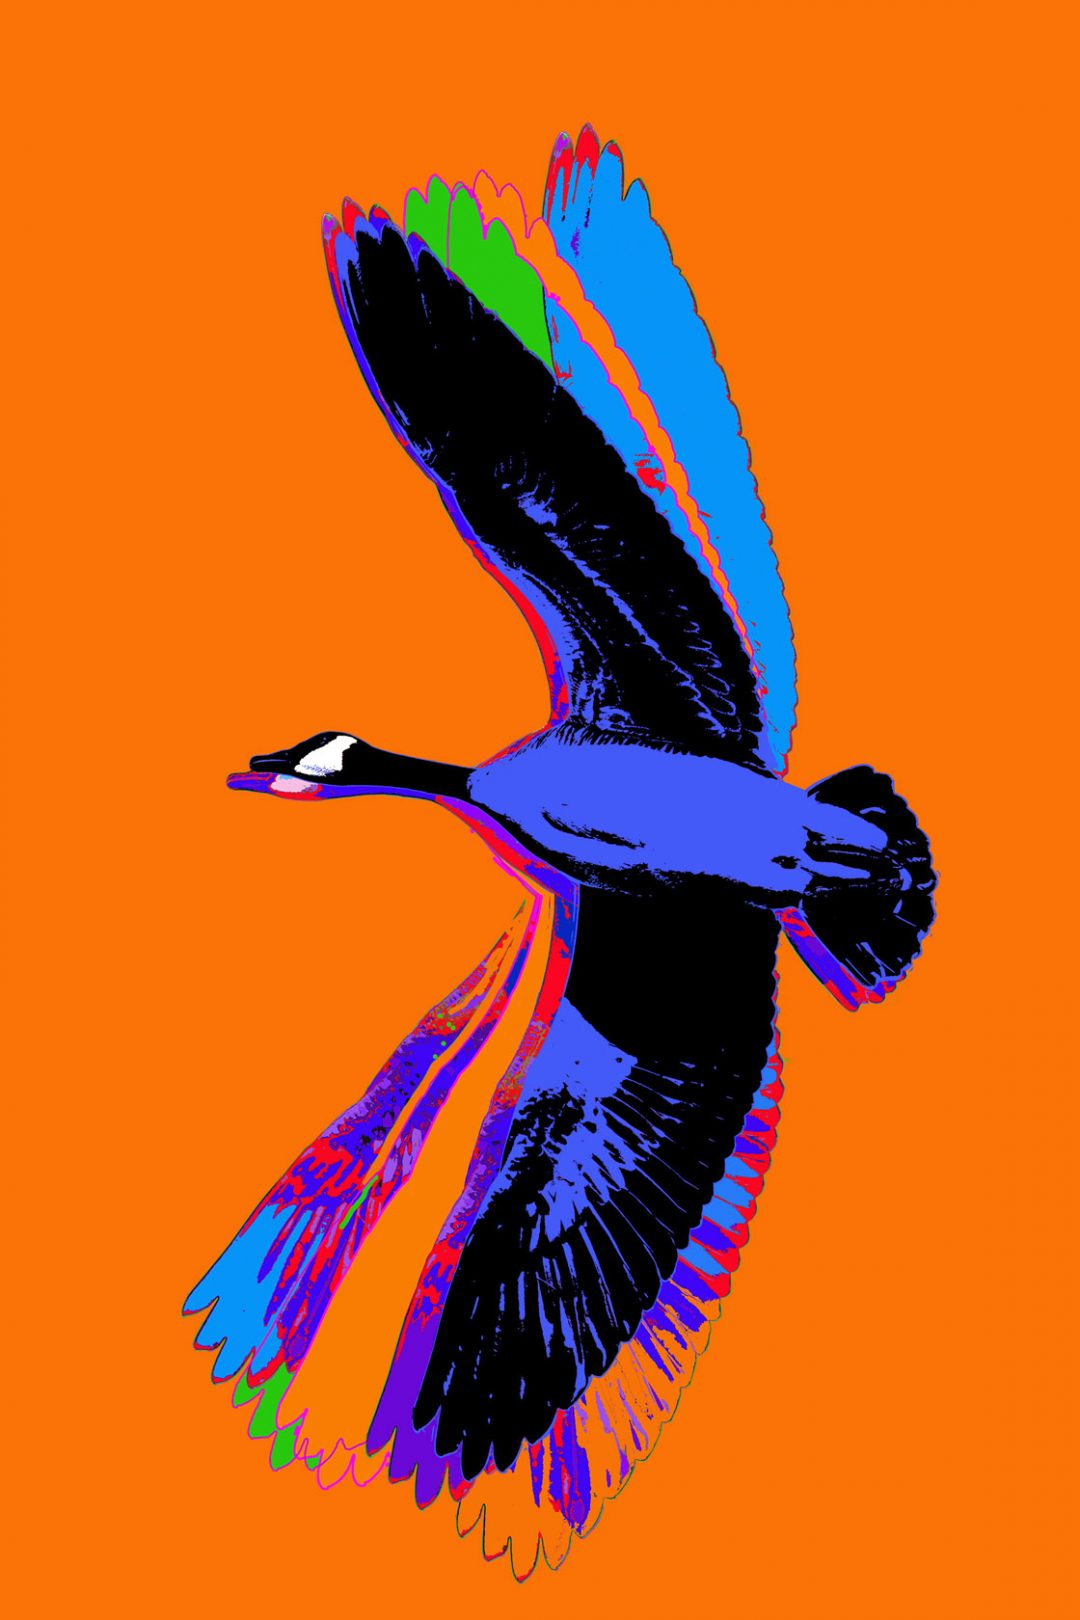 Flight (Canada Goose from Made in Canada part 2) 2019 (Orange)